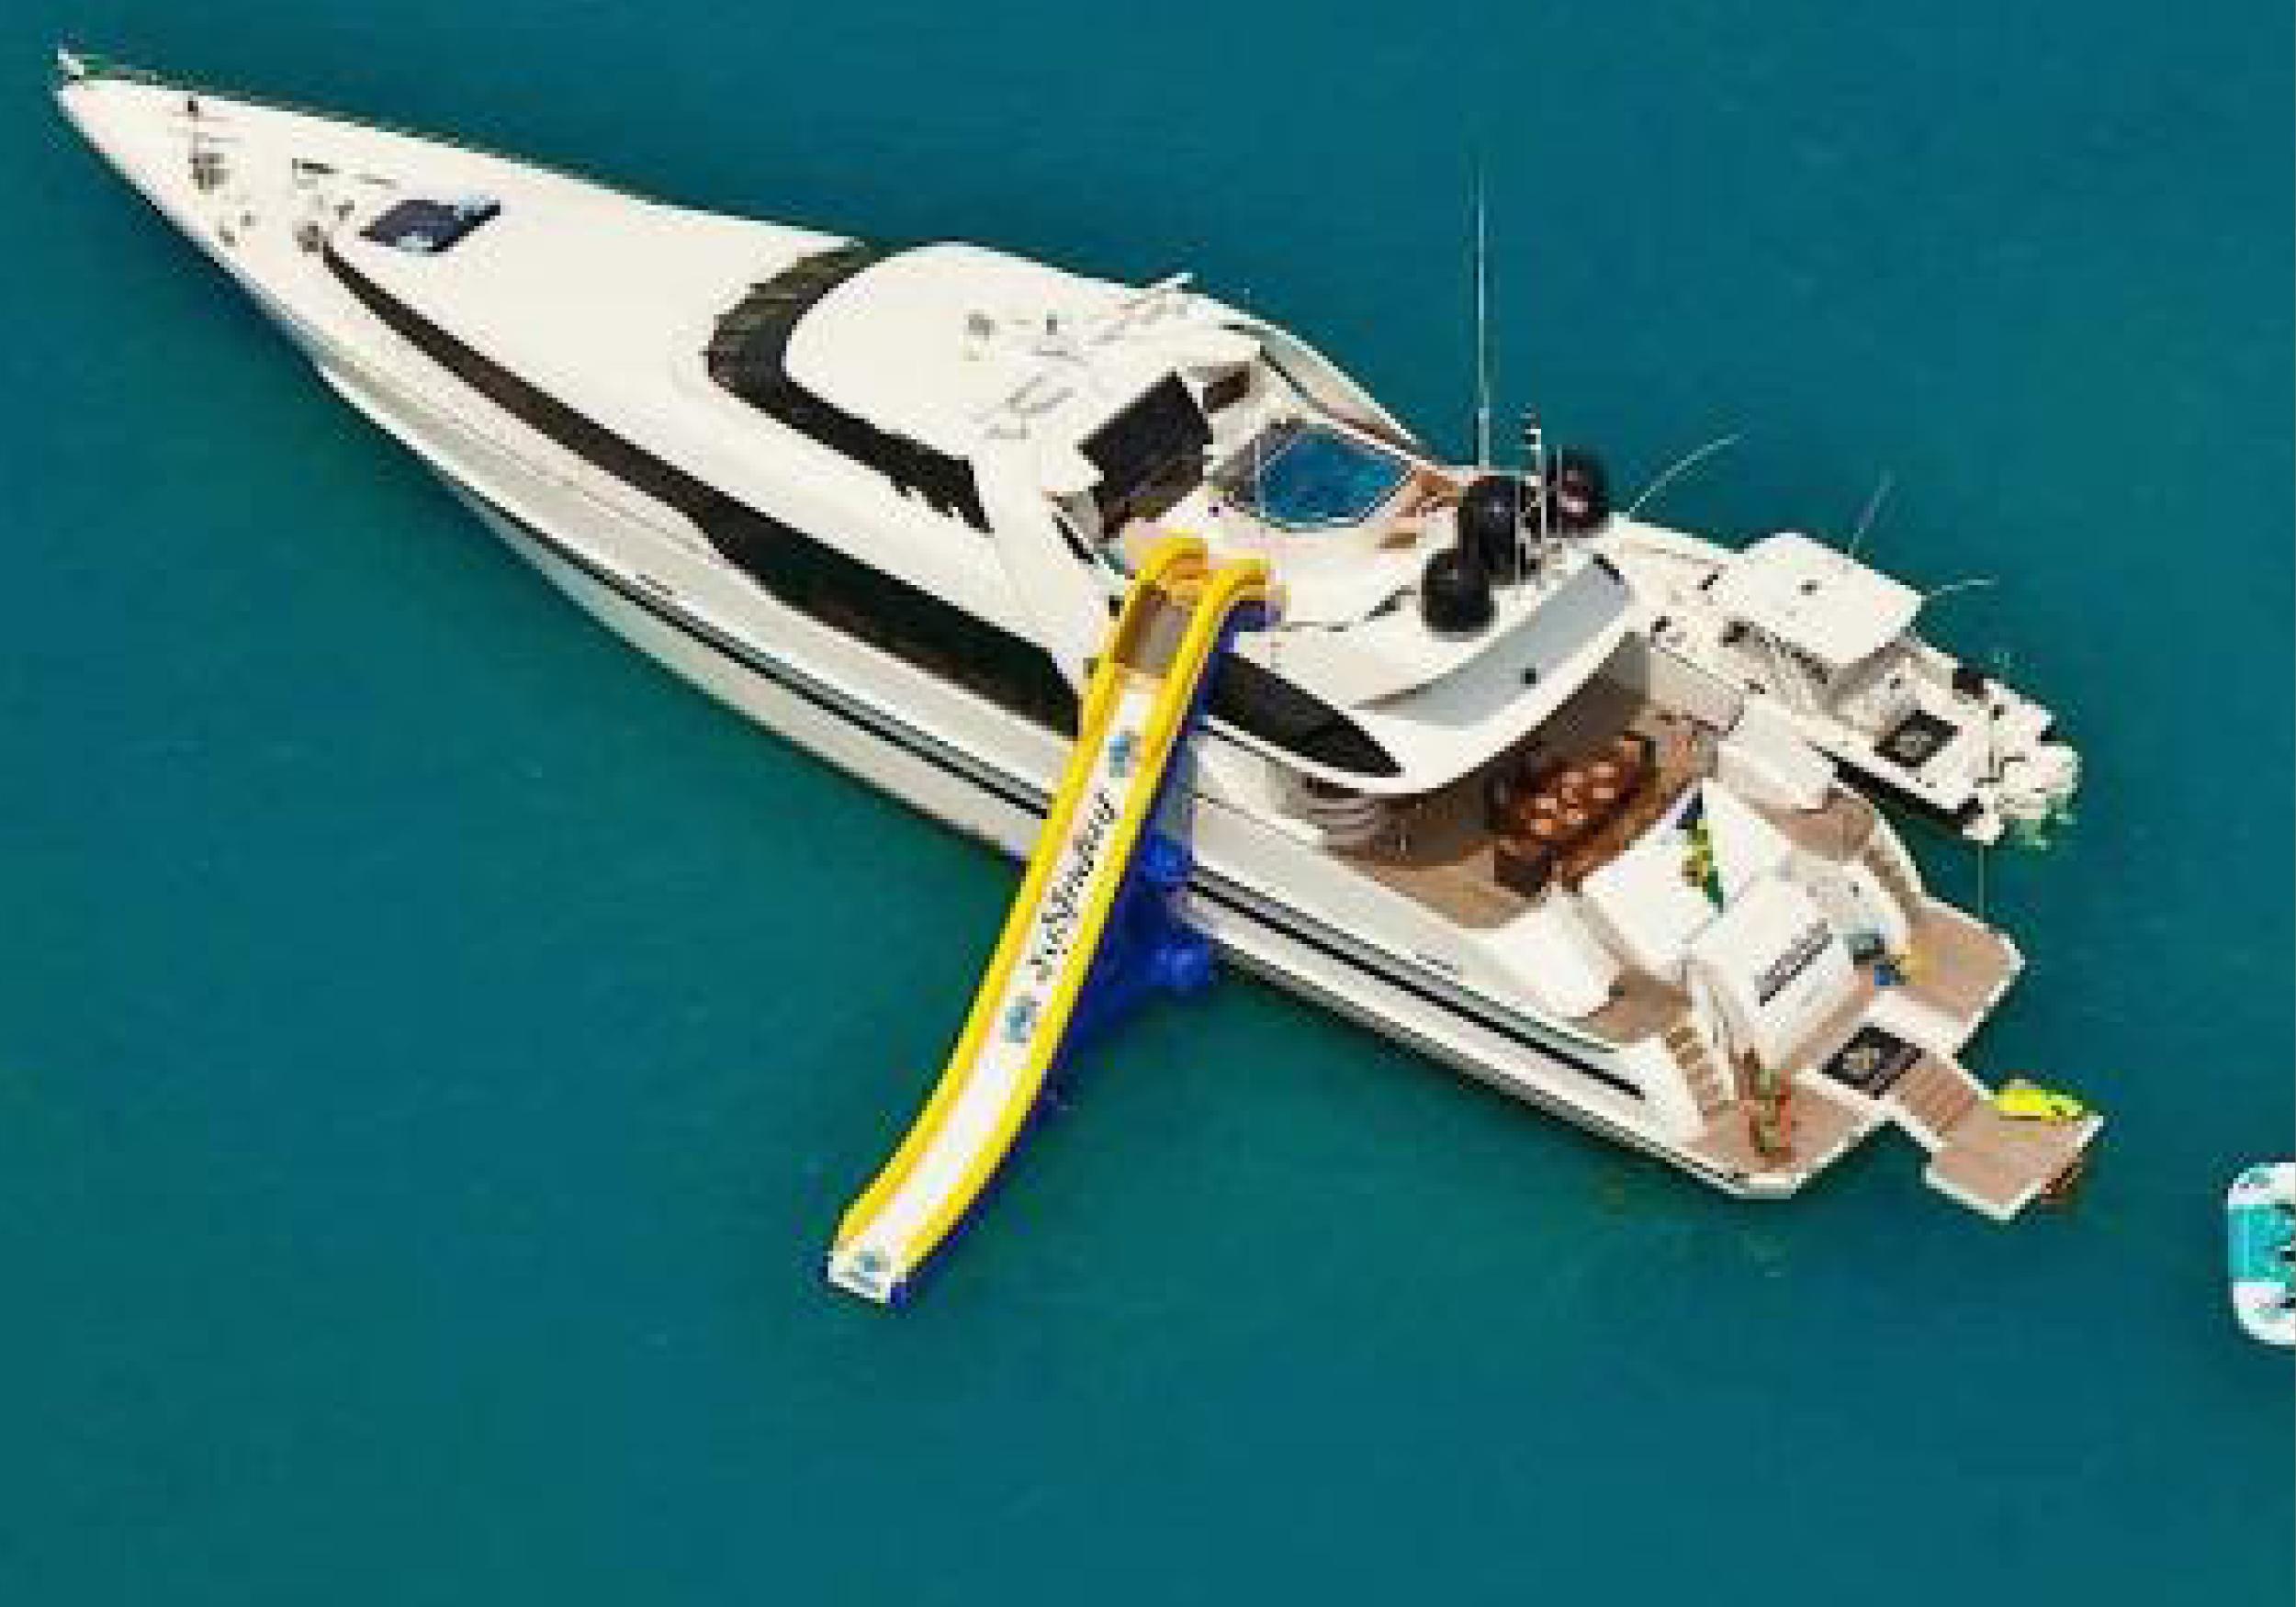 Karen-Lynn-Interior-Design-Yacht-Impulsive-2.jpg